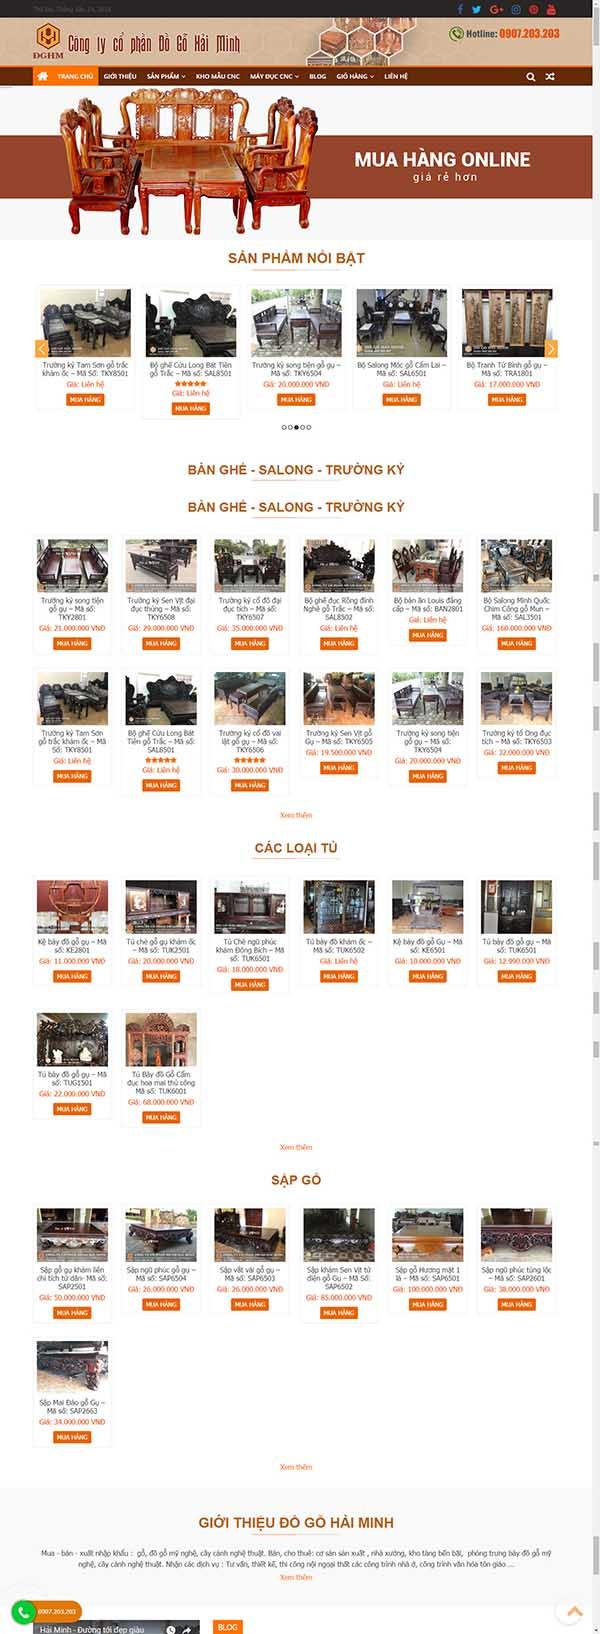 Thiết kế Mẫu website đồ gỗ 05